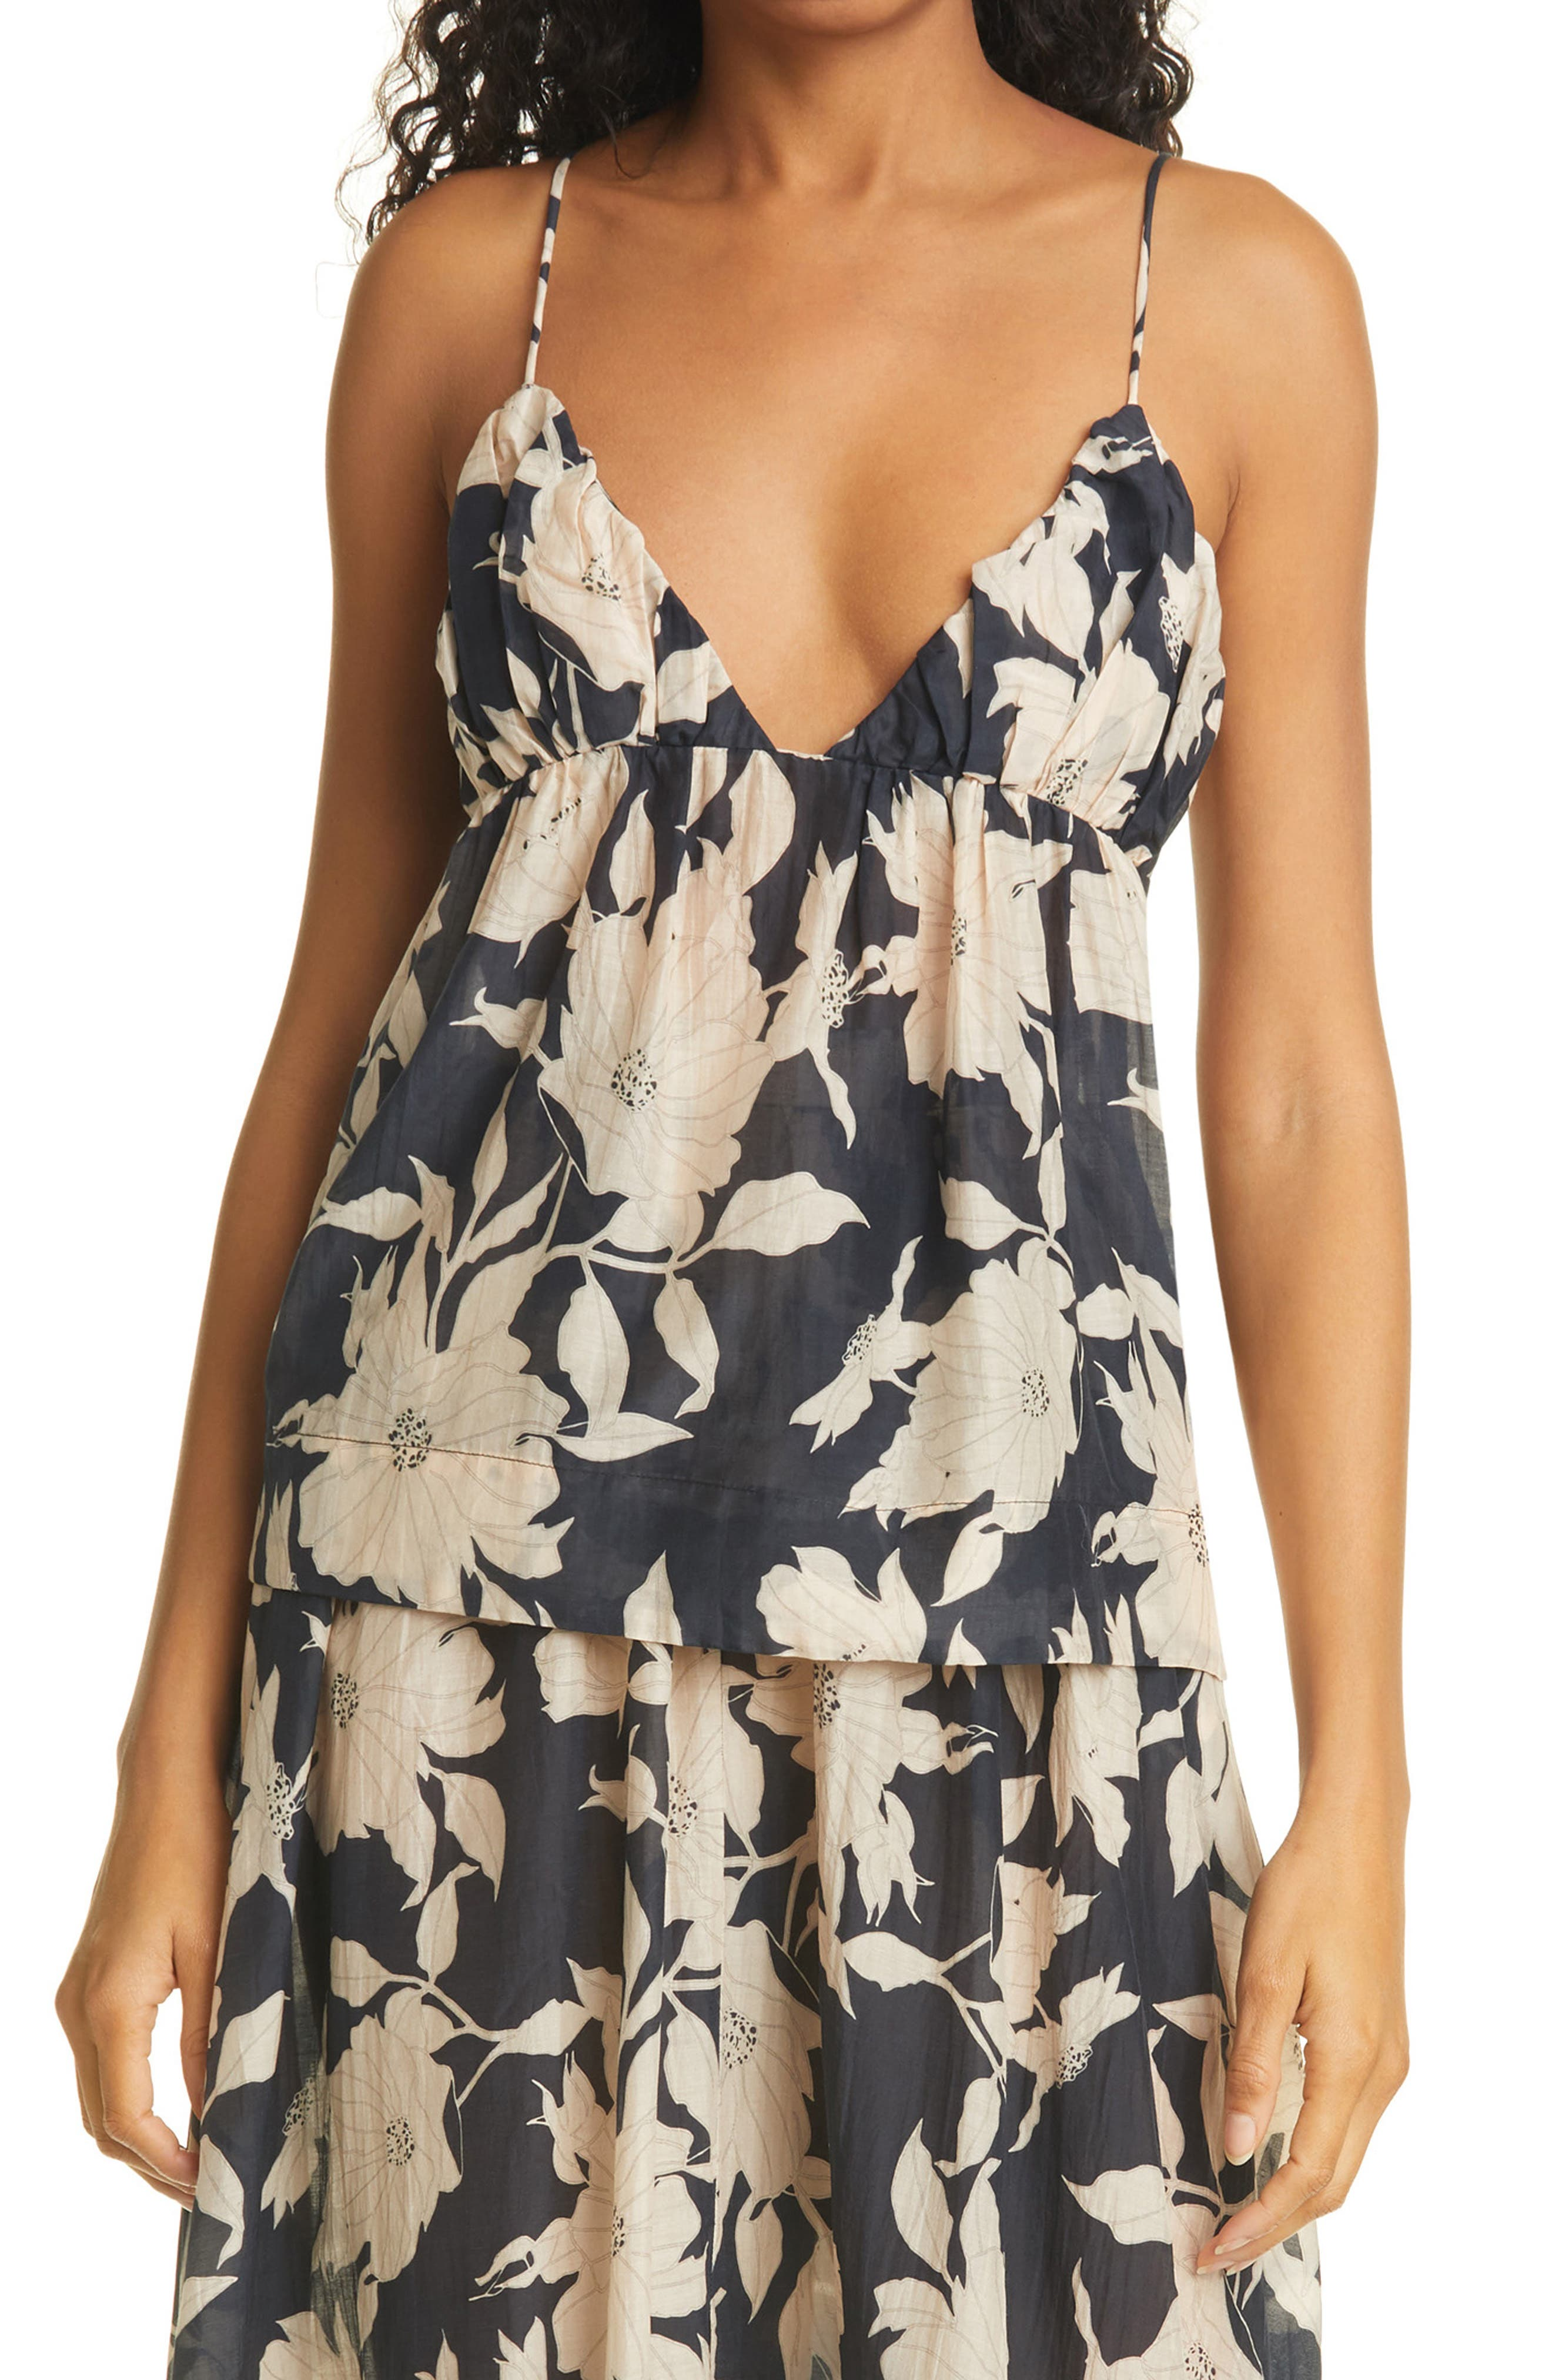 Olada Floral Print Camisole